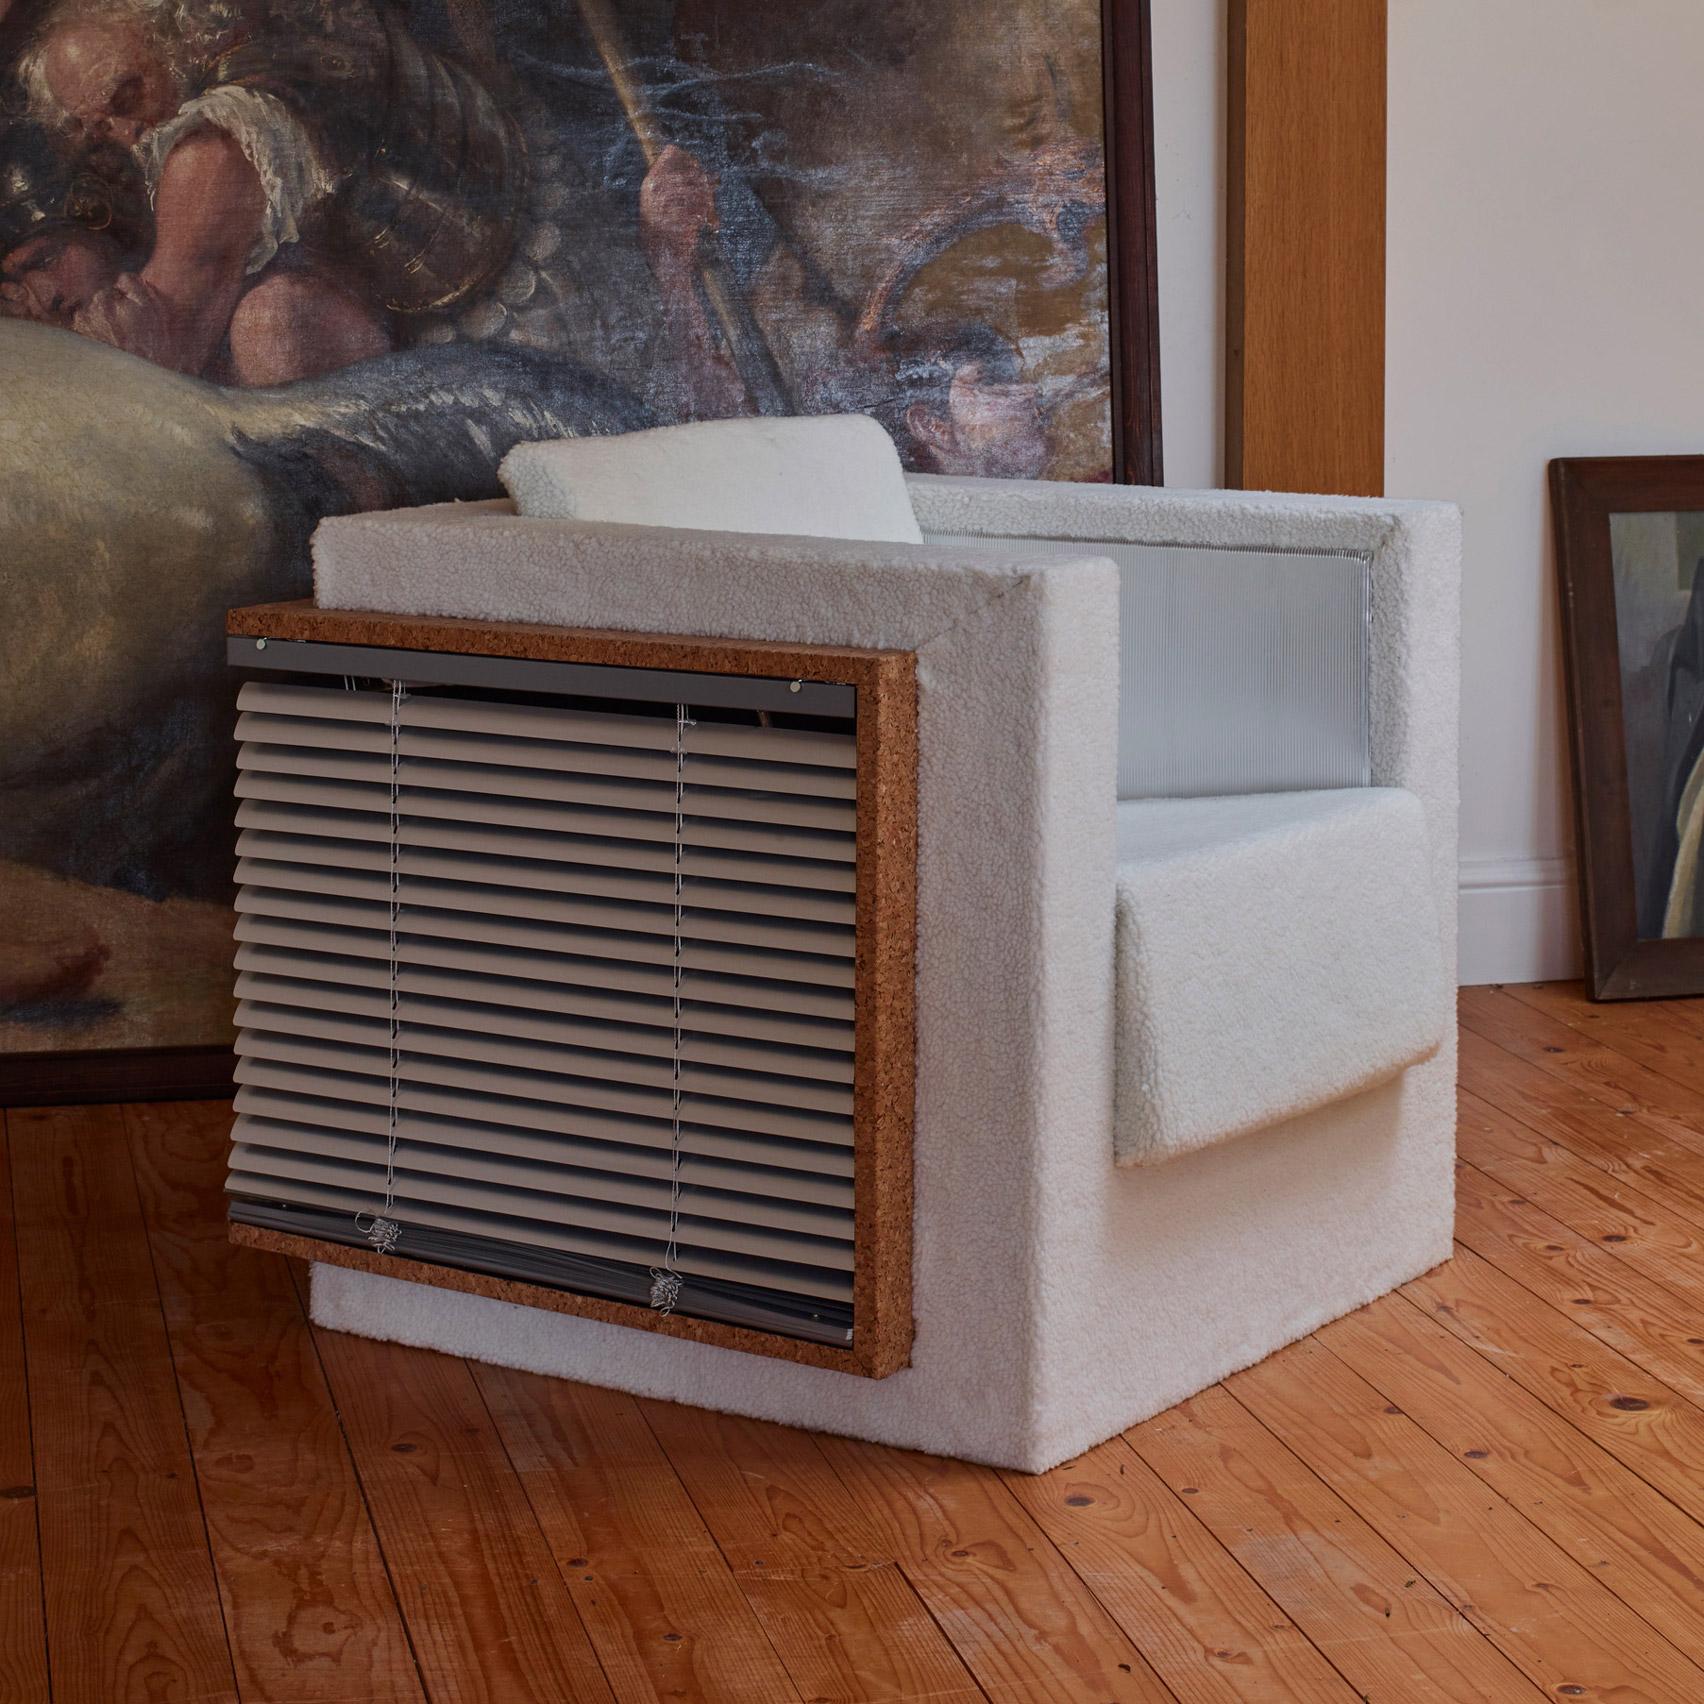 ejr-barnes-furniture-design-sq-1